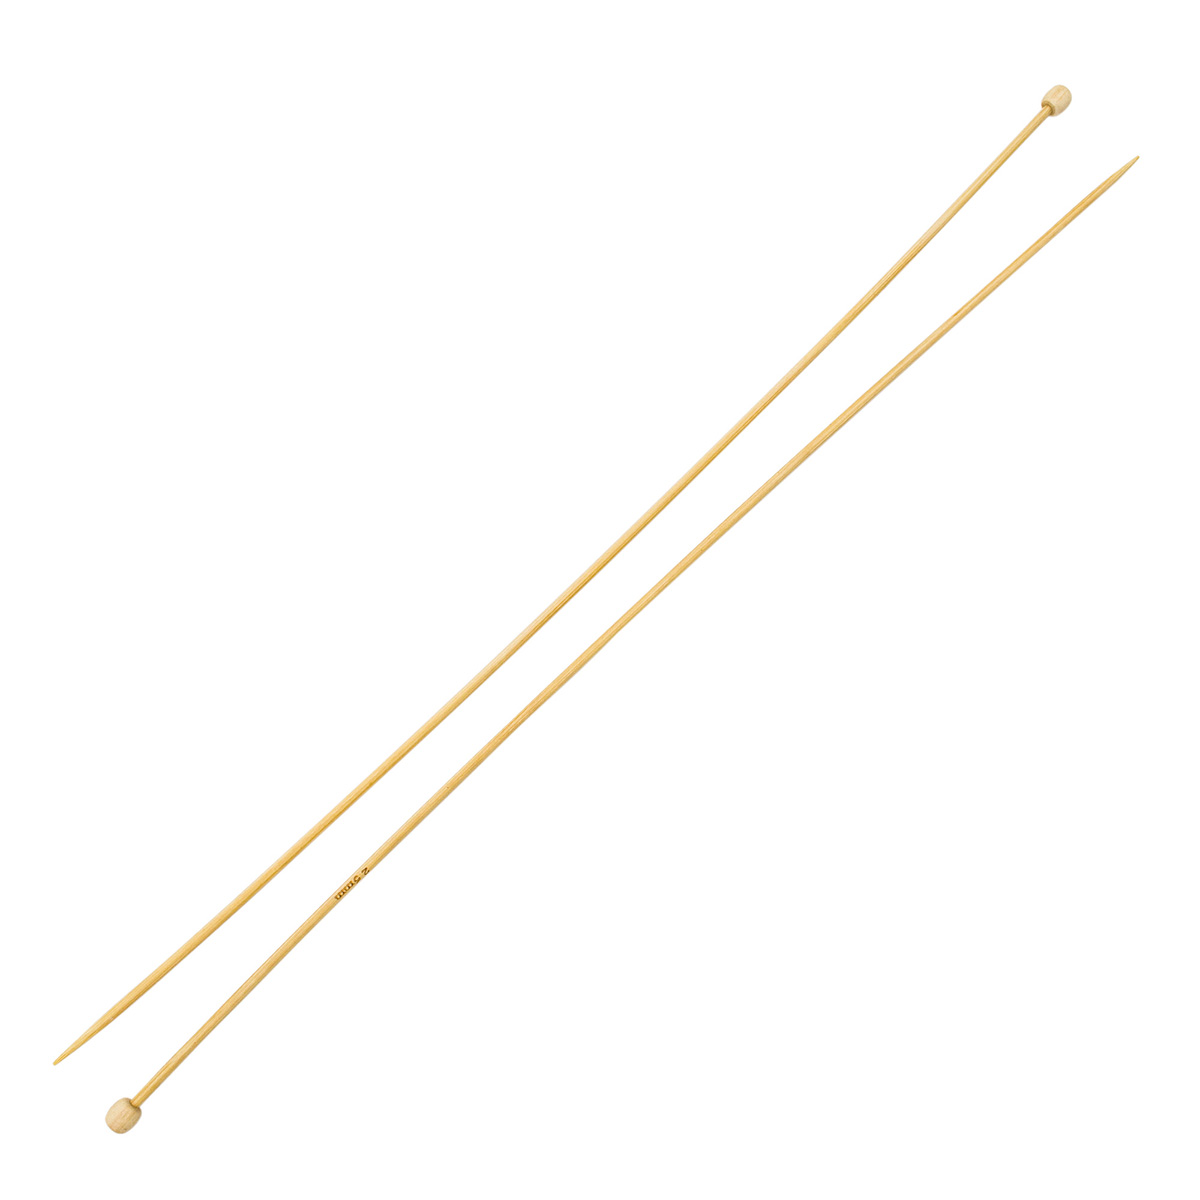 Спицы прямые бамбук 942225, 35 см, 2,5 мм, Hobby&Pro